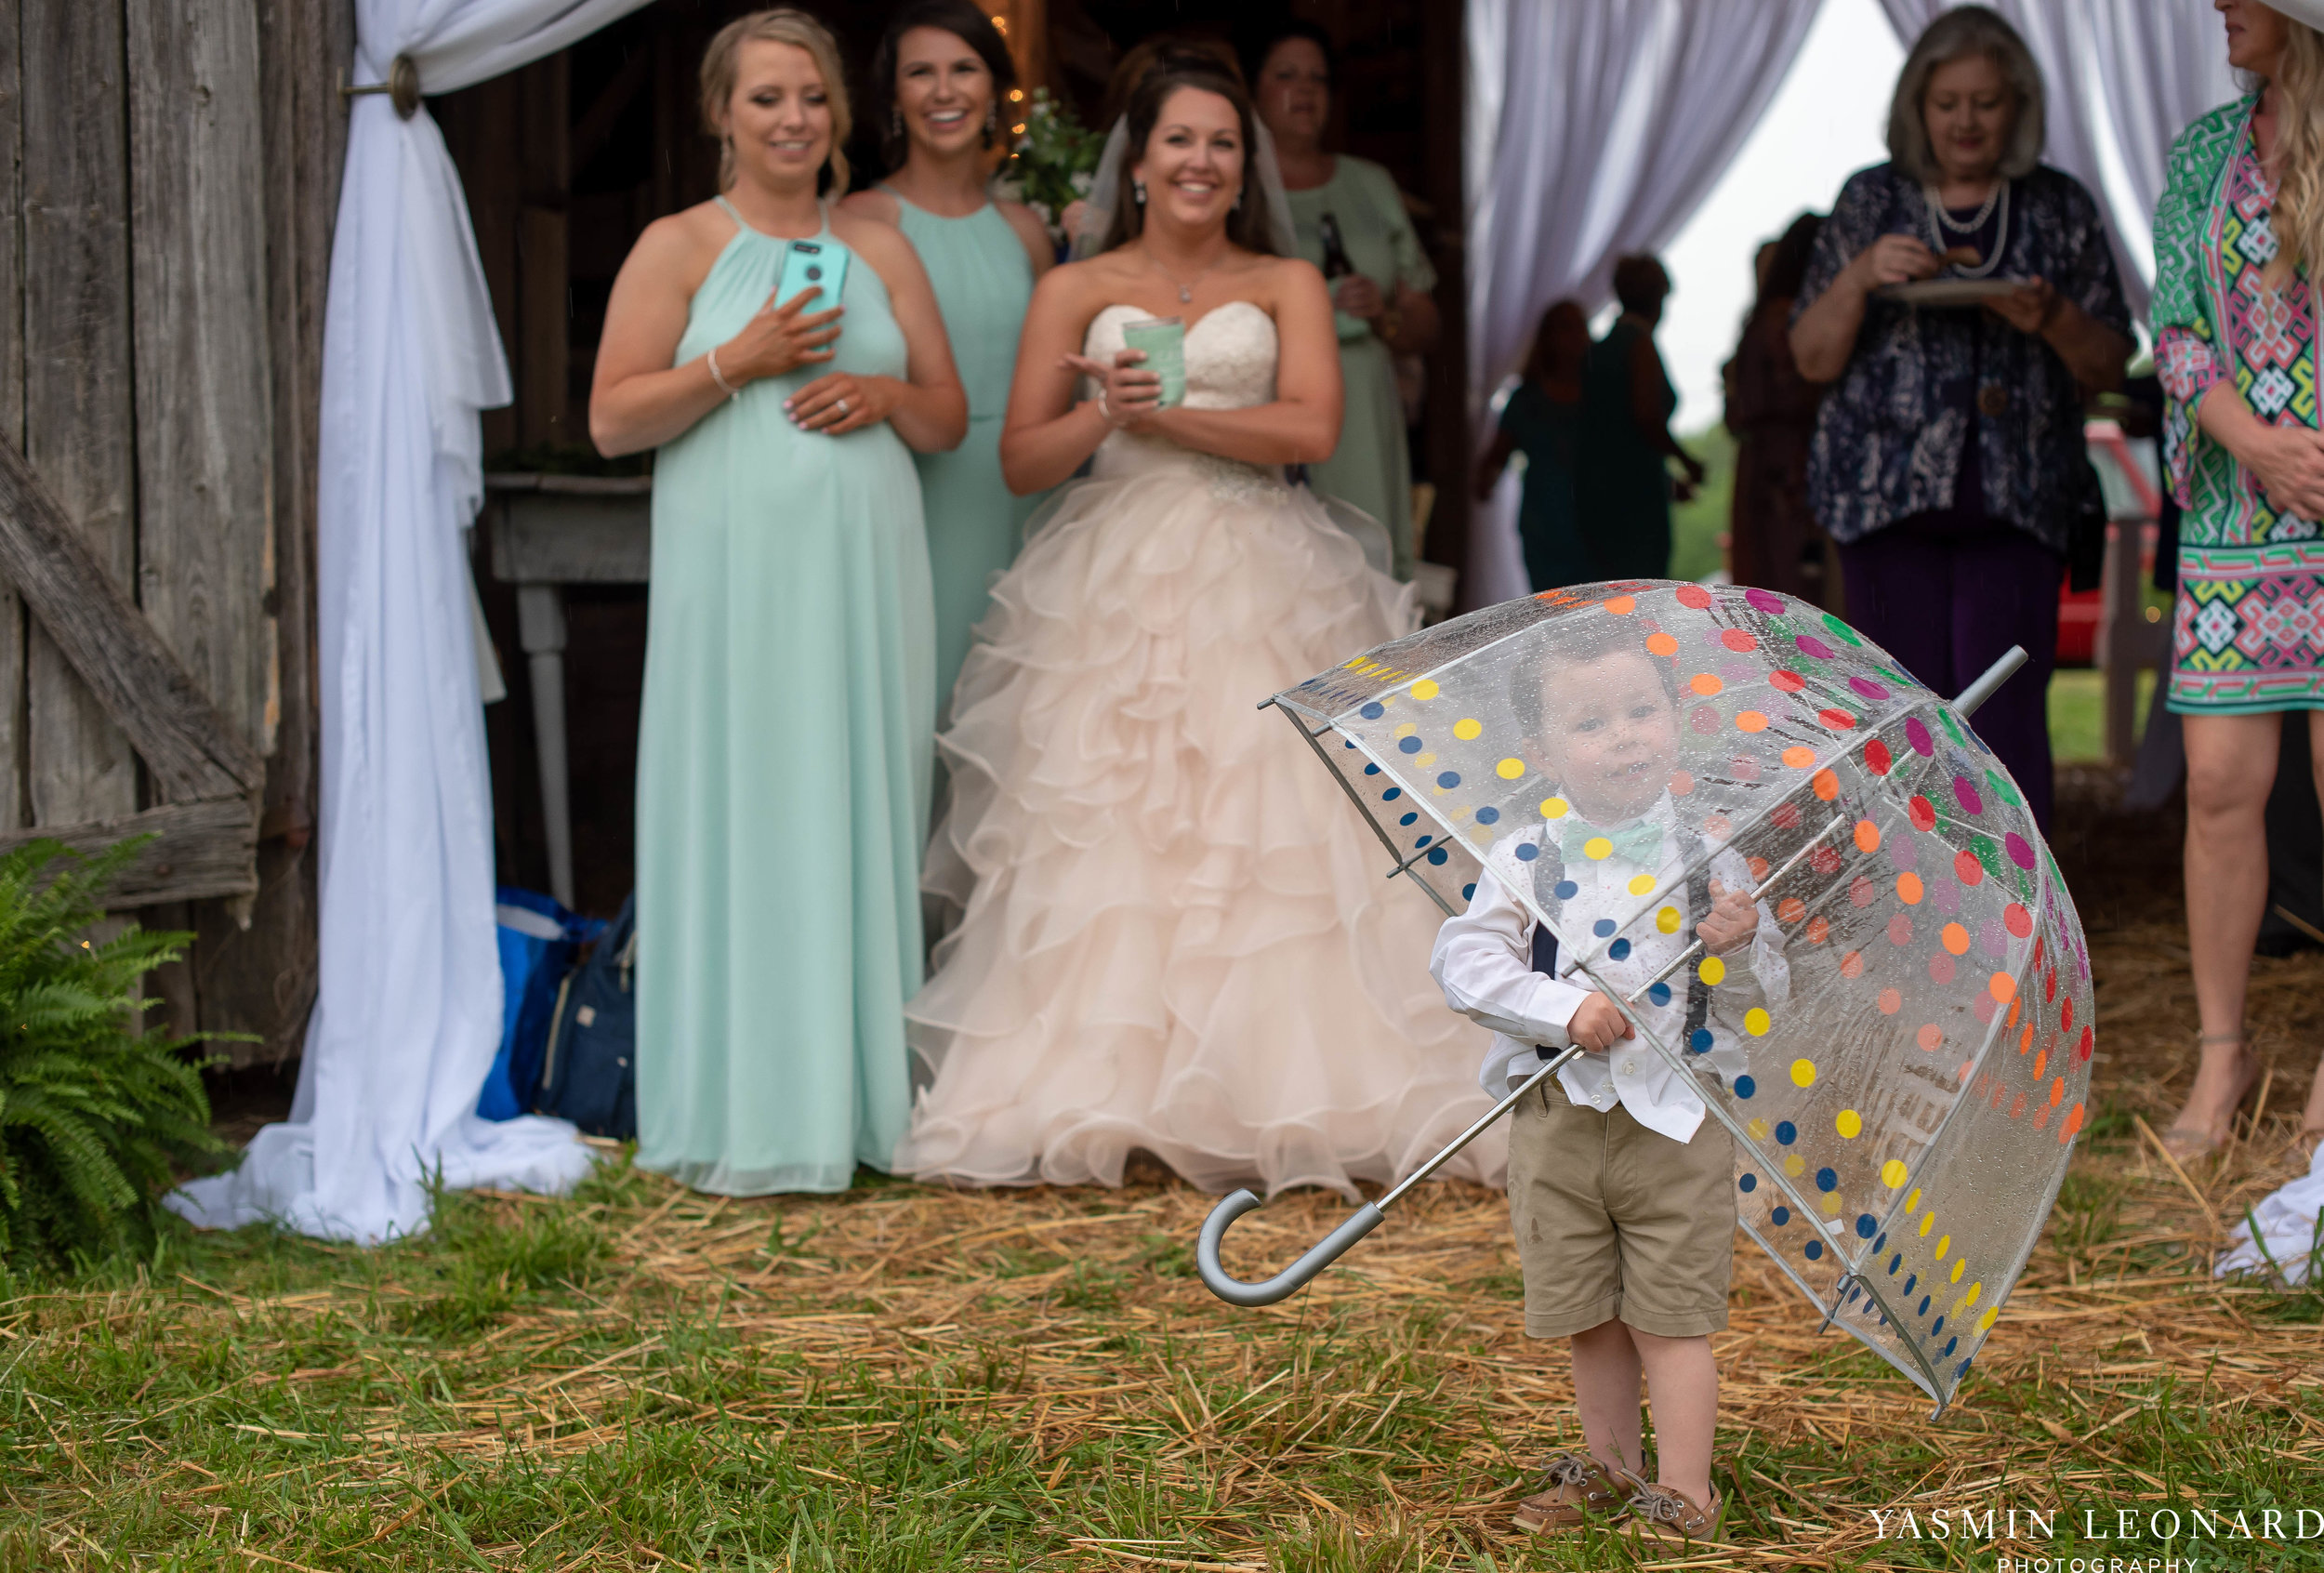 Rain on your wedding day - Rainy Wedding - Plan B for Rain - What to do if it rains on your wedding day - Wedding Inspiration - Outdoor wedding ideas - Rainy Wedding Pictures - Yasmin Leonard Photography-58.jpg